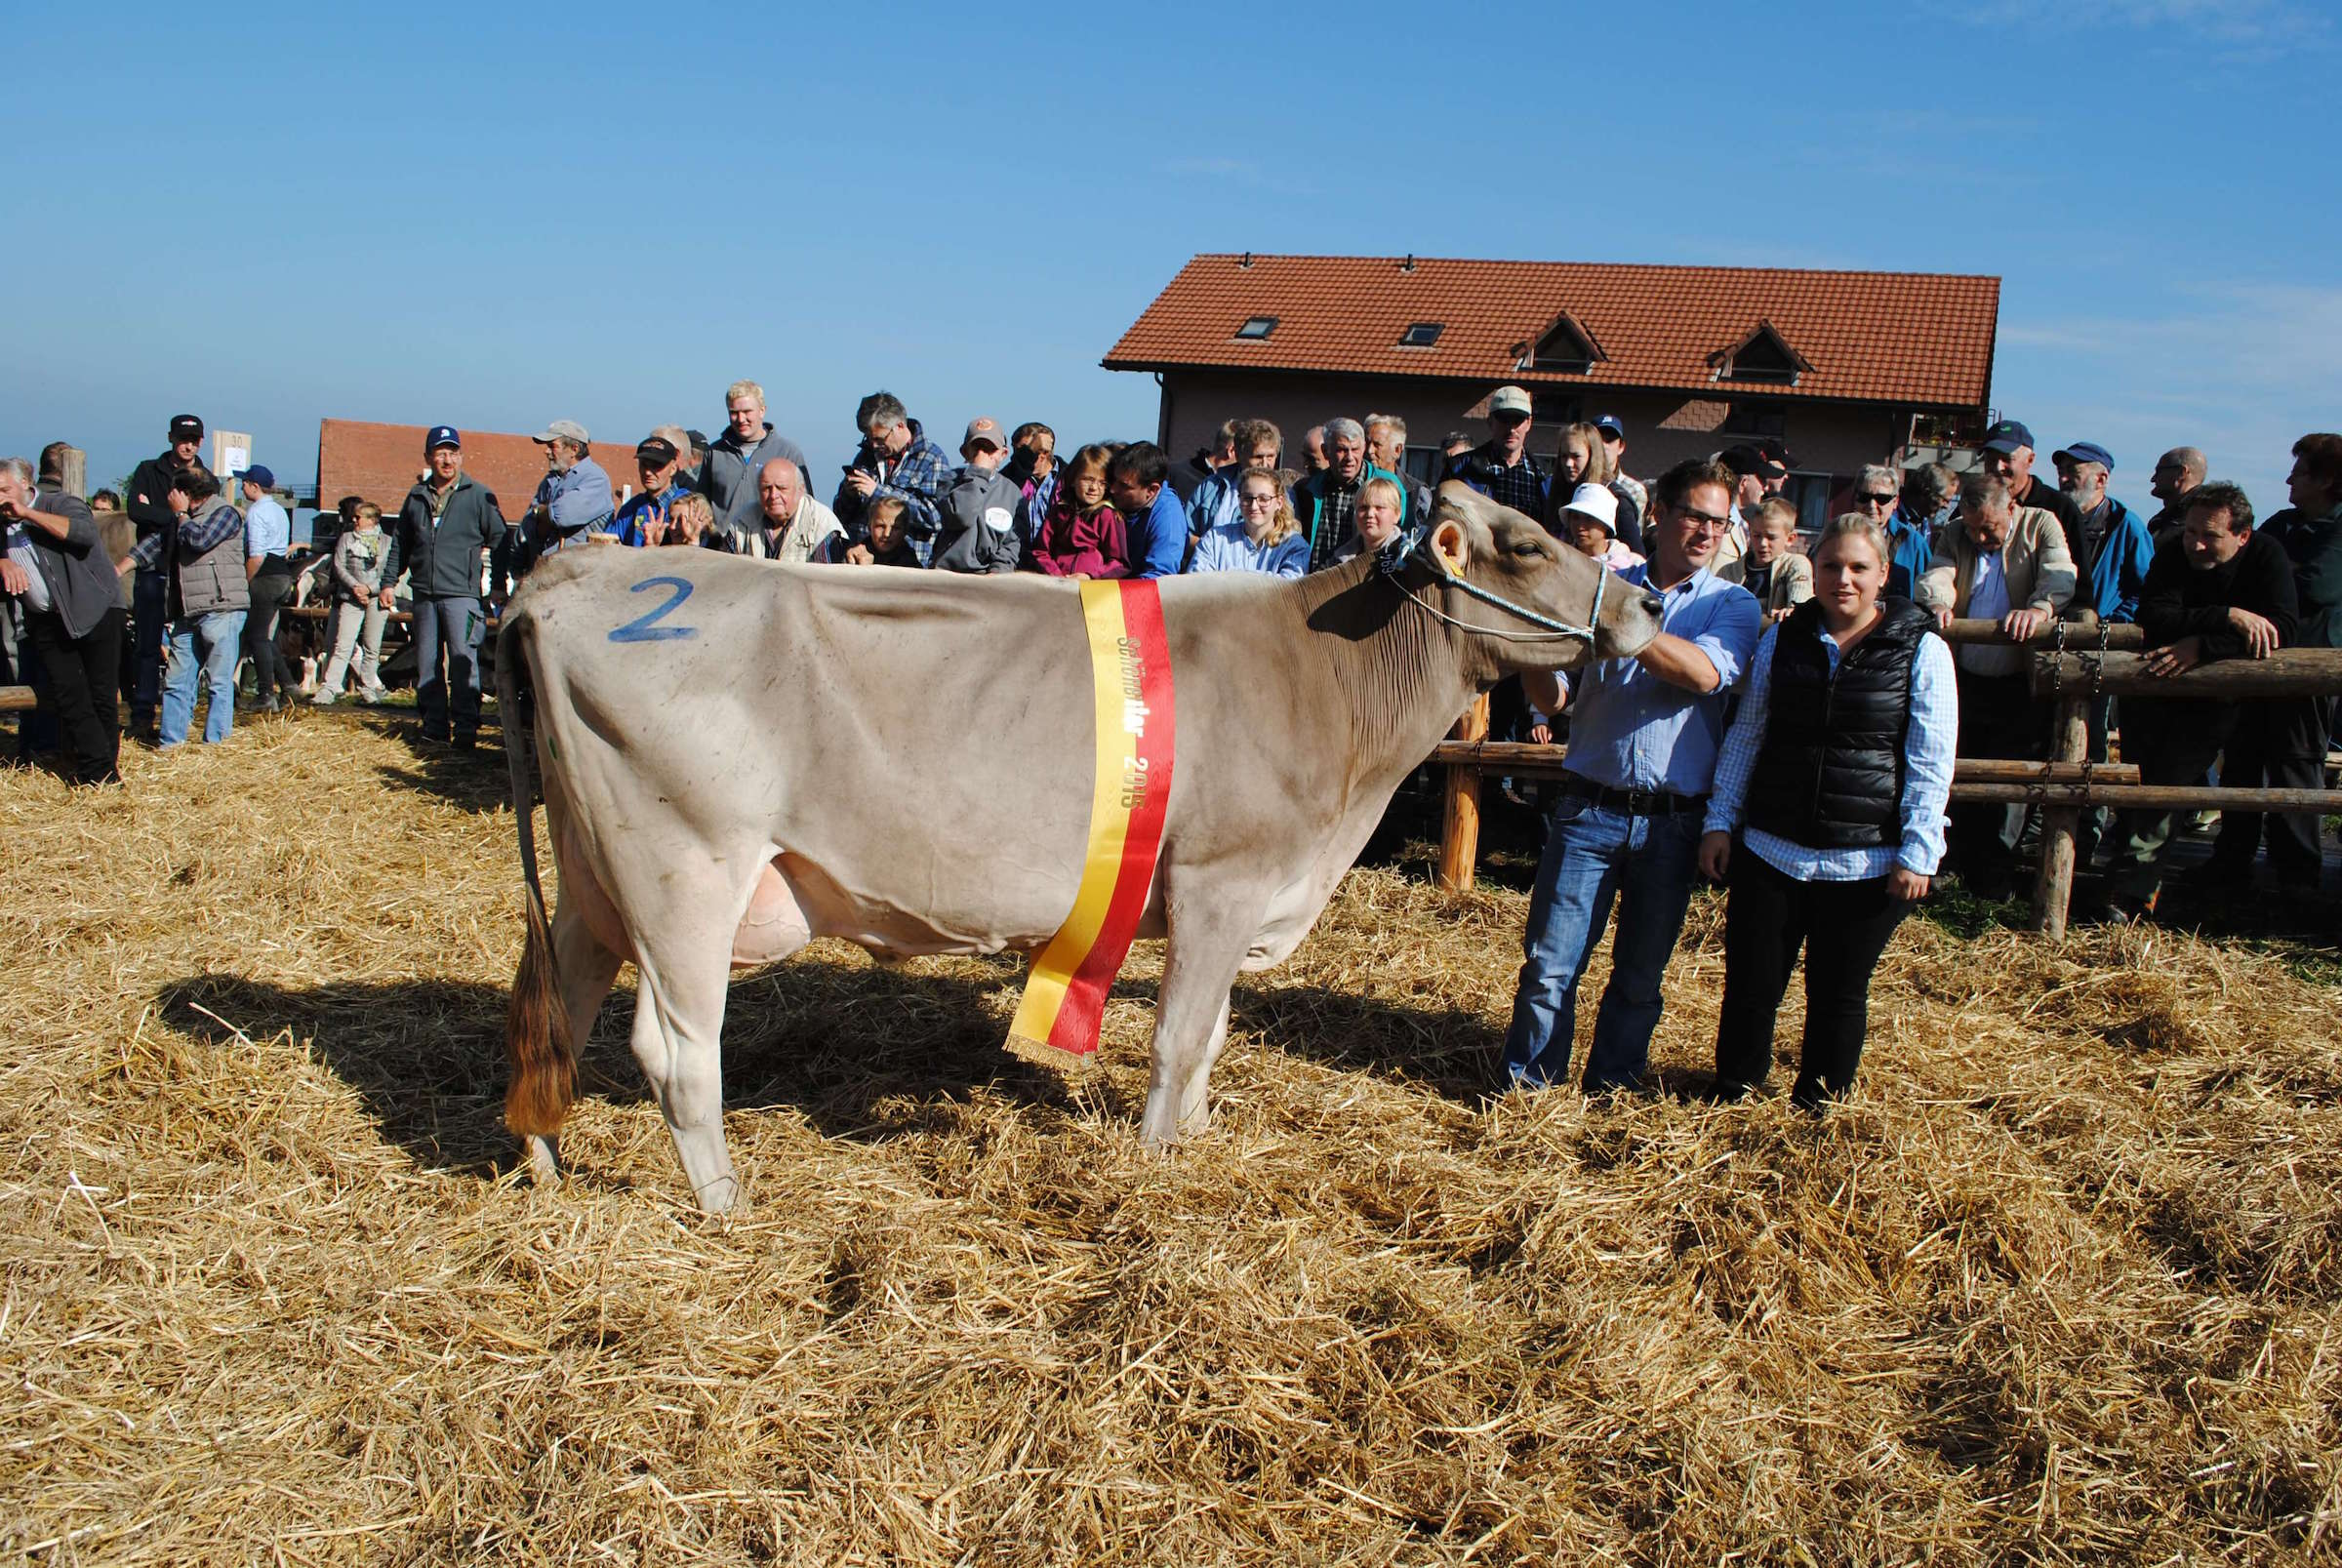 Schoeneuter mittlere Kuehe, Solana, Schatt Armin, Feusisberg (gross)